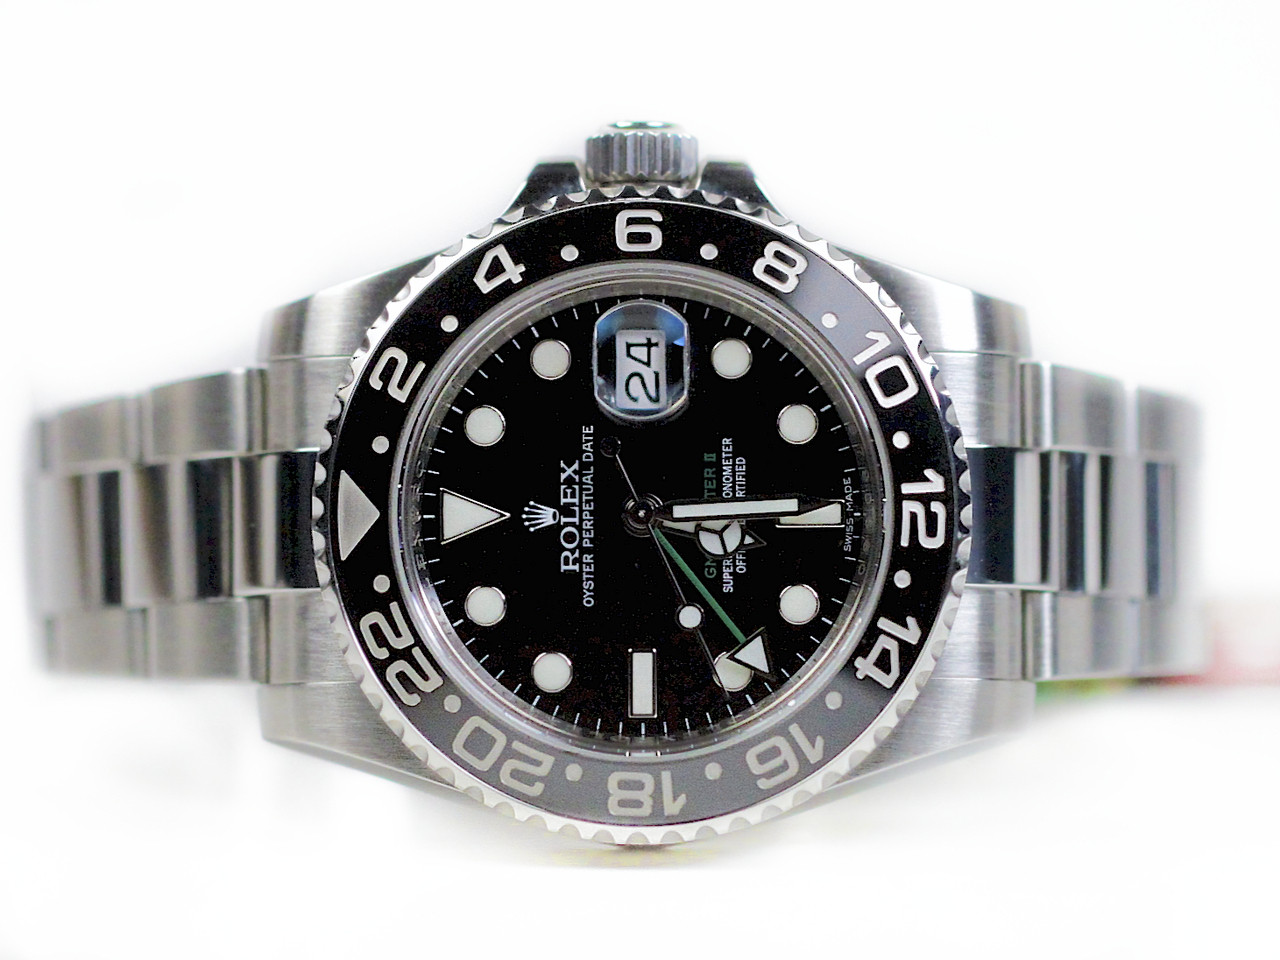 0470f54c5261 Rolex Watch GMT Master II Steel Ceramic New Style 116710 LN Swiss  www.legendoftime.com